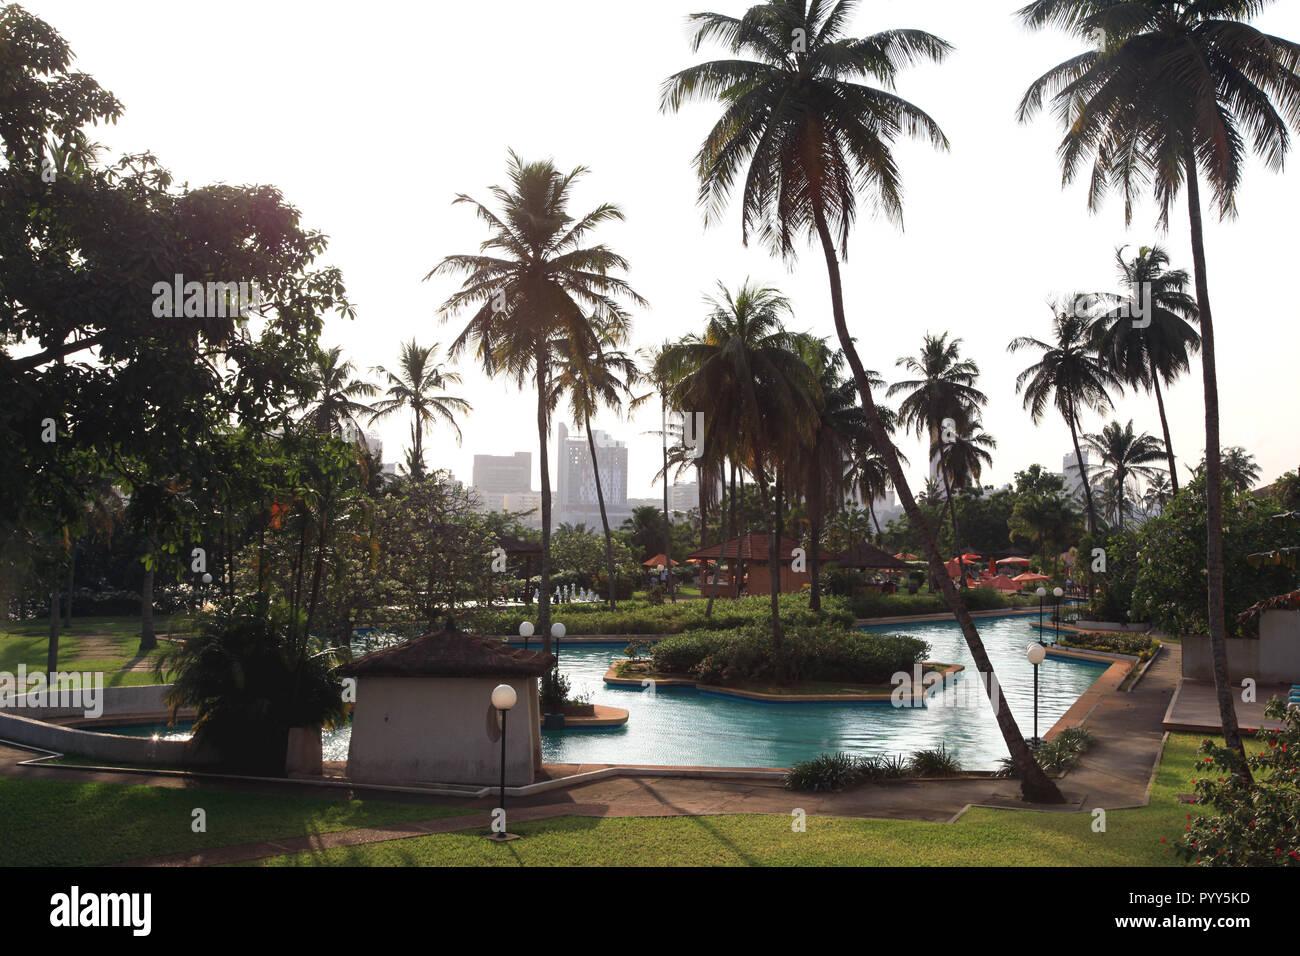 Pools at Sofitel, Abidjan, Cote d'Ivoire - Stock Image